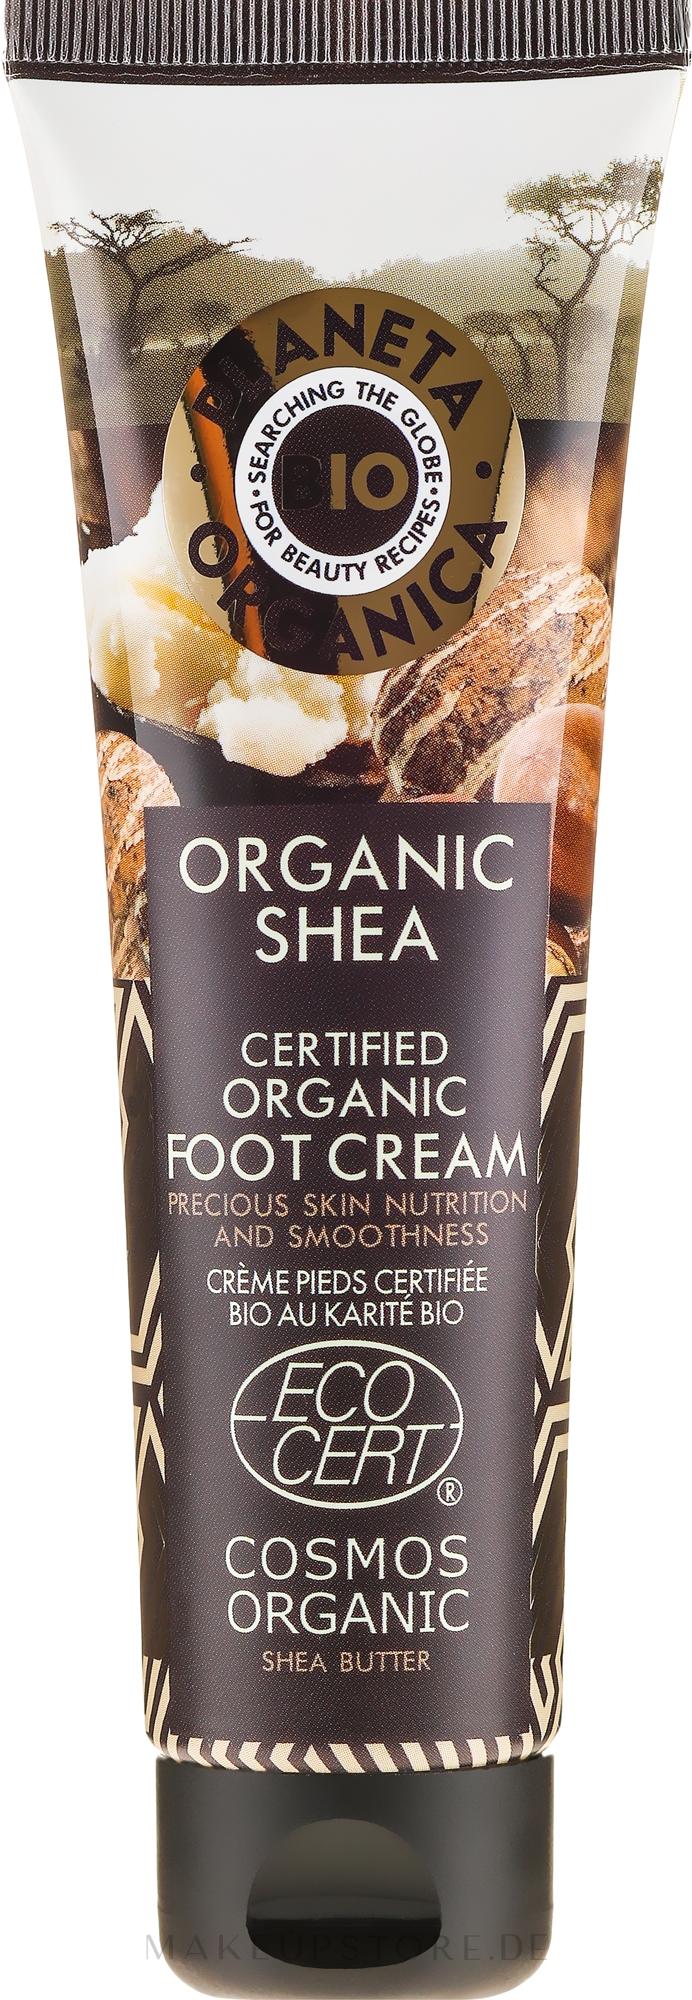 Nährende Fußcreme mit Sheabutter - Planeta Organica Organic Shea Foot Cream — Bild 75 ml